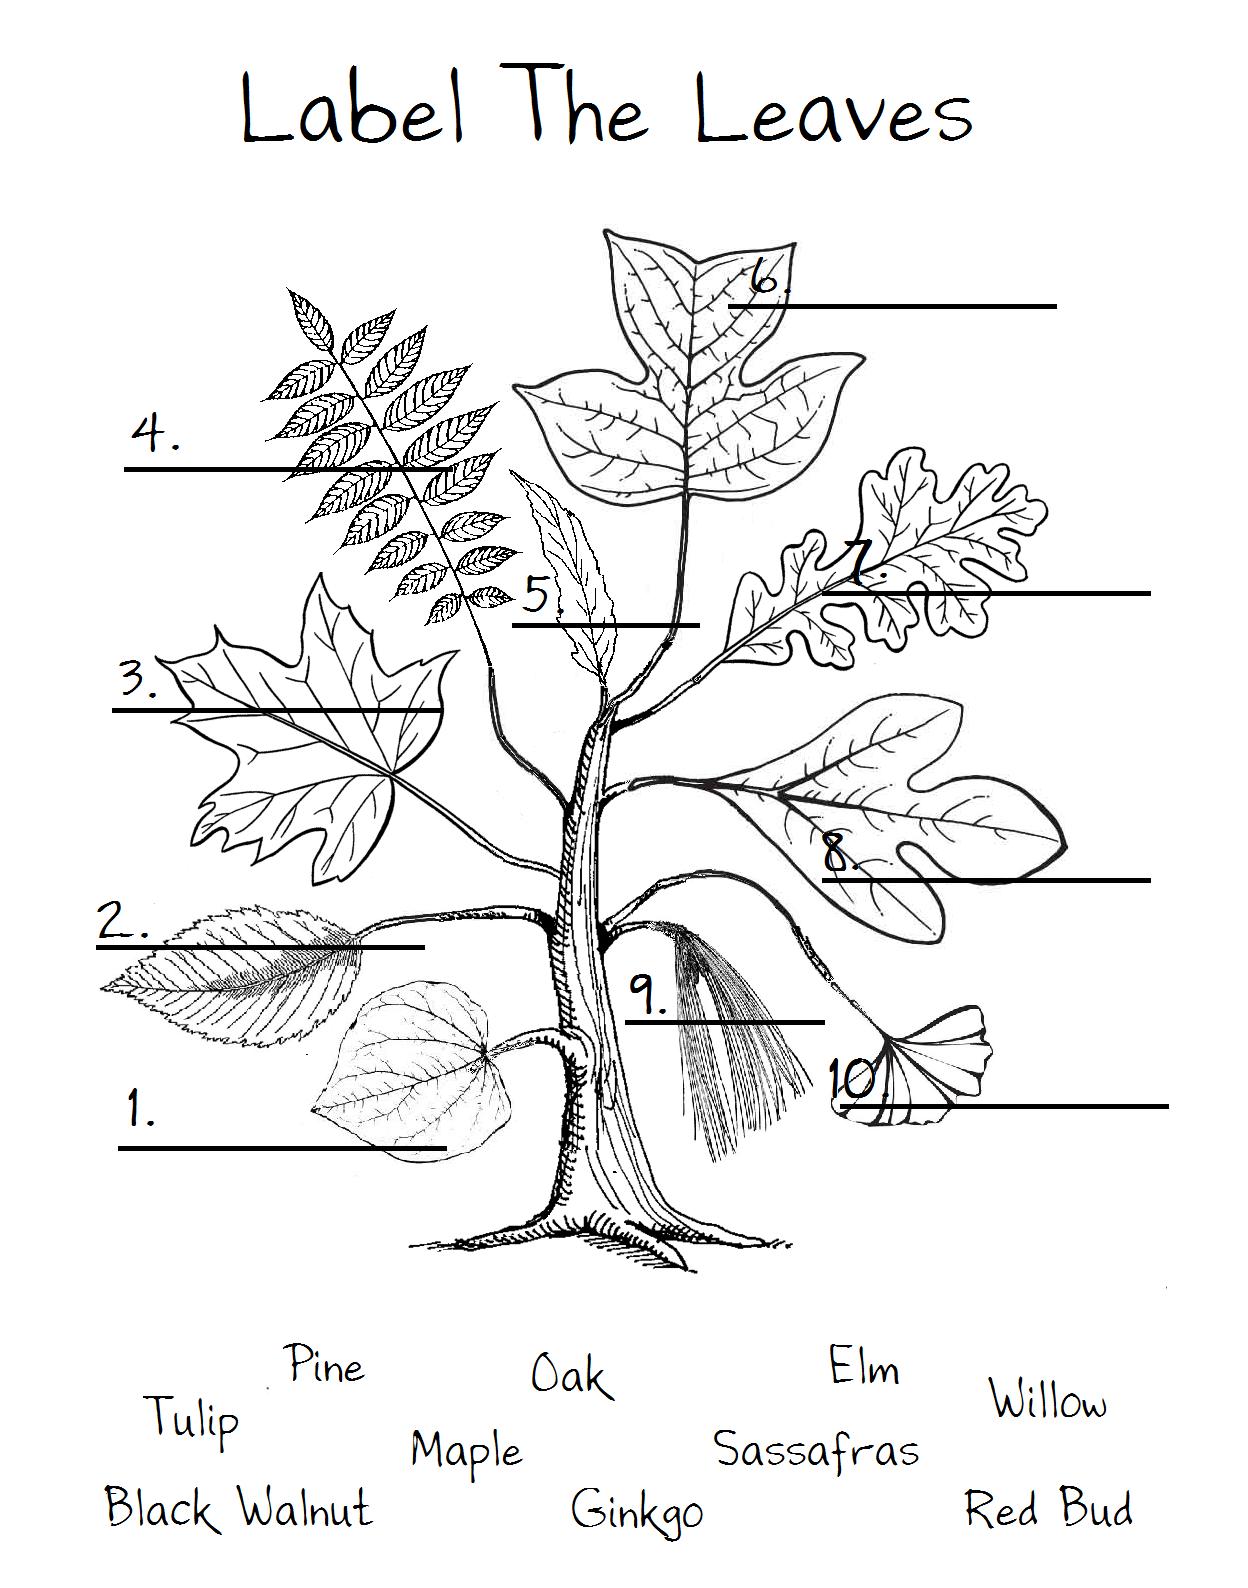 1. red bud 2. elm 3. maple 4. black walnut 5. willow 6